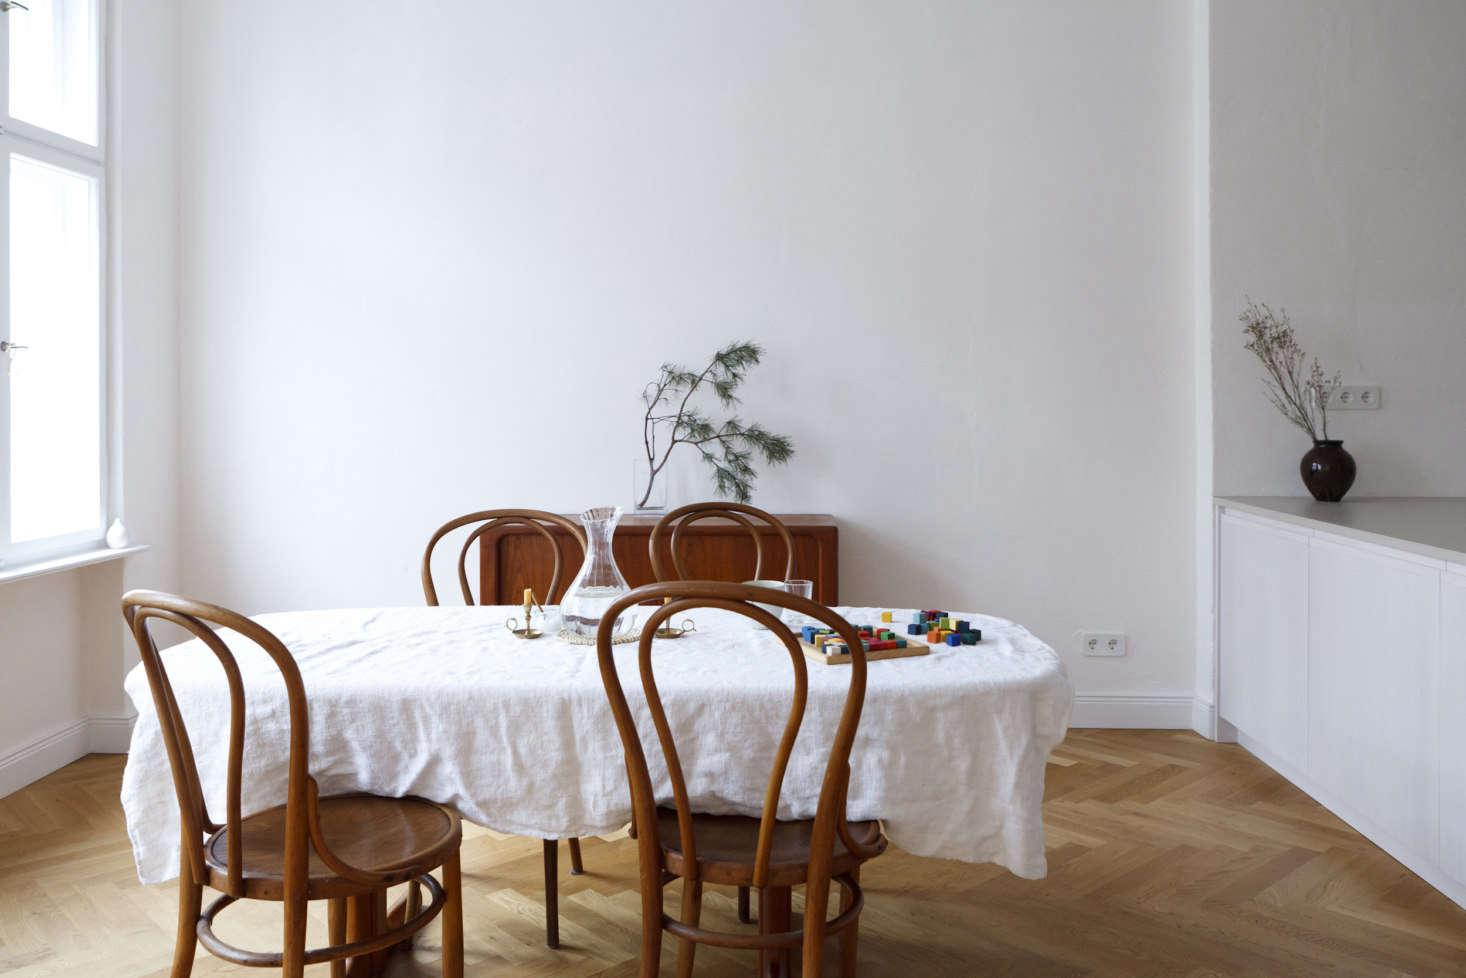 https://cdn.remodelista.com/wp-content/uploads/2018/03/berlin-apartment-kitchen-by-studio-oink-10-1466x978.jpg